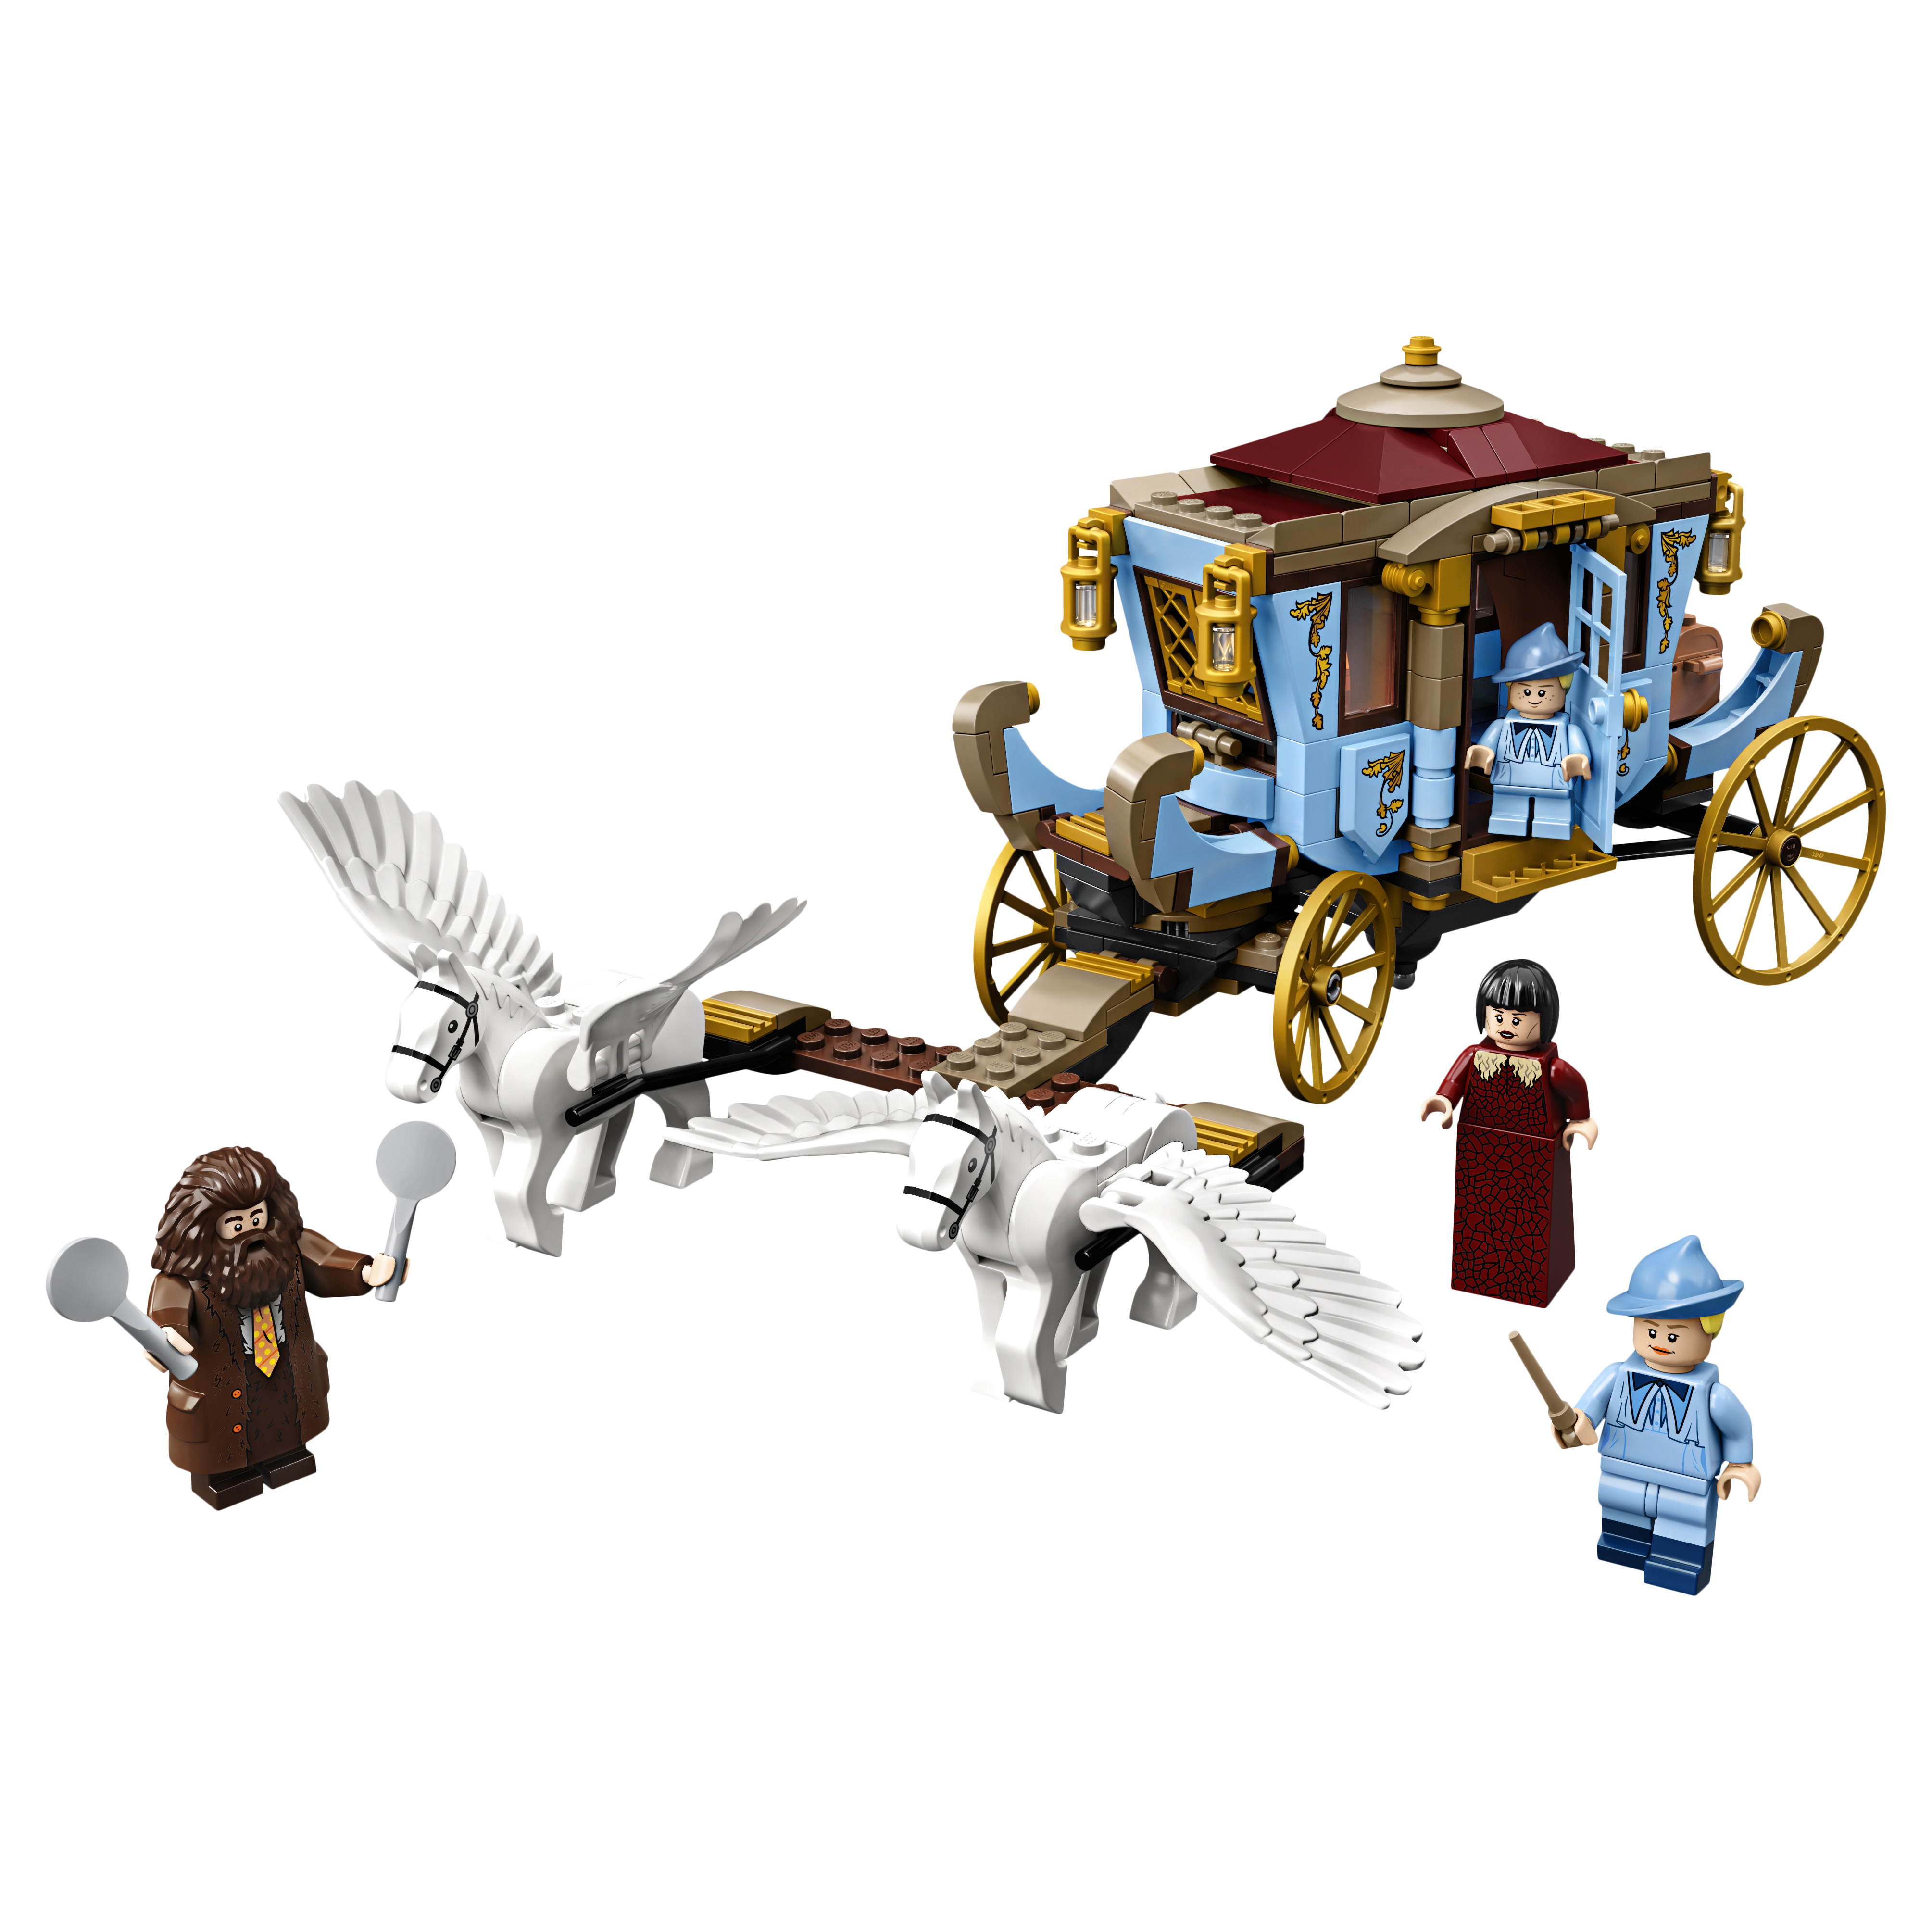 Конструктор LEGO Harry Potter 75958 Карета школы Шармбатон: приезд в Хогвартс фото